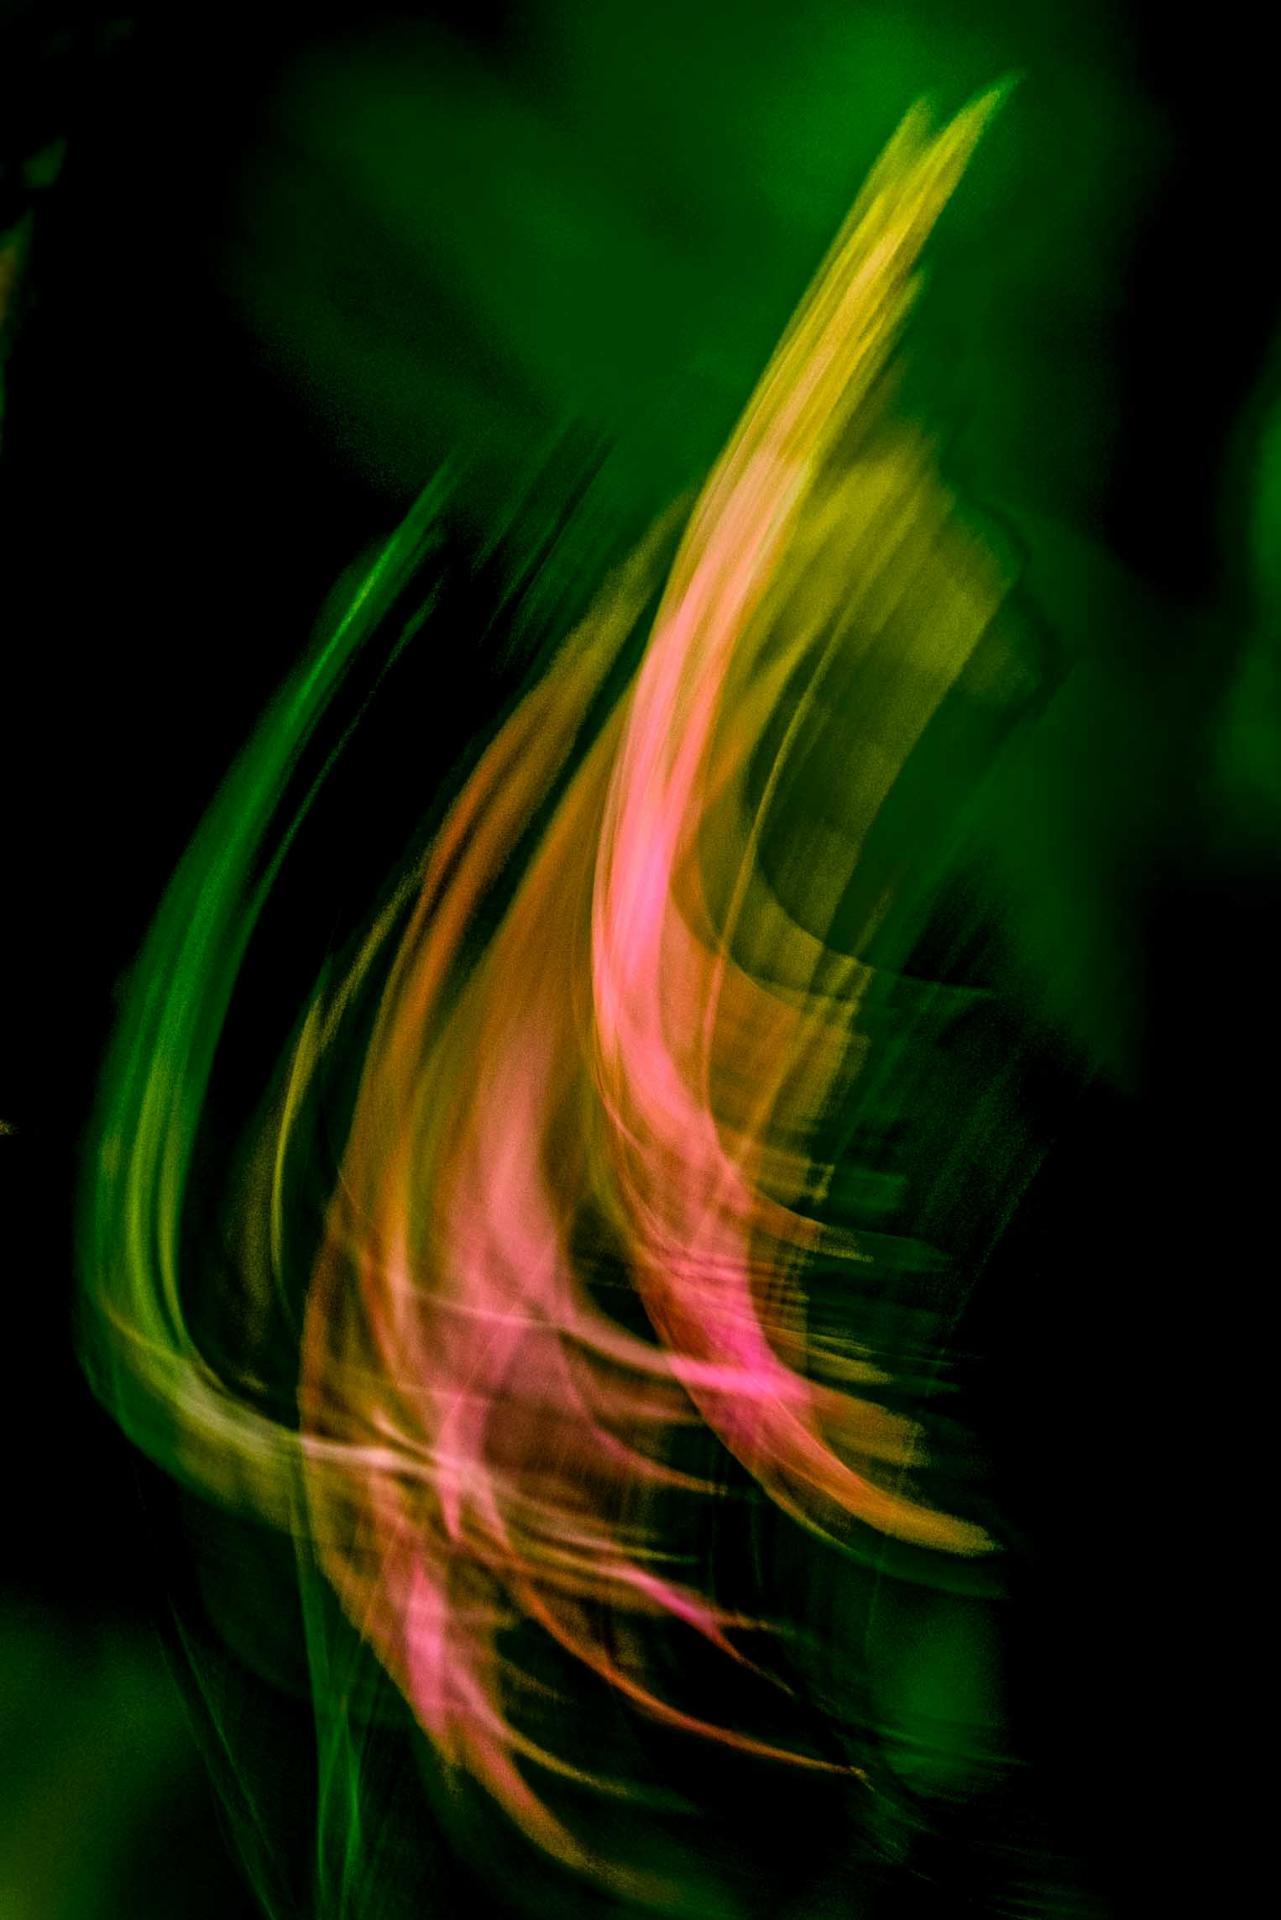 Mouvement colore